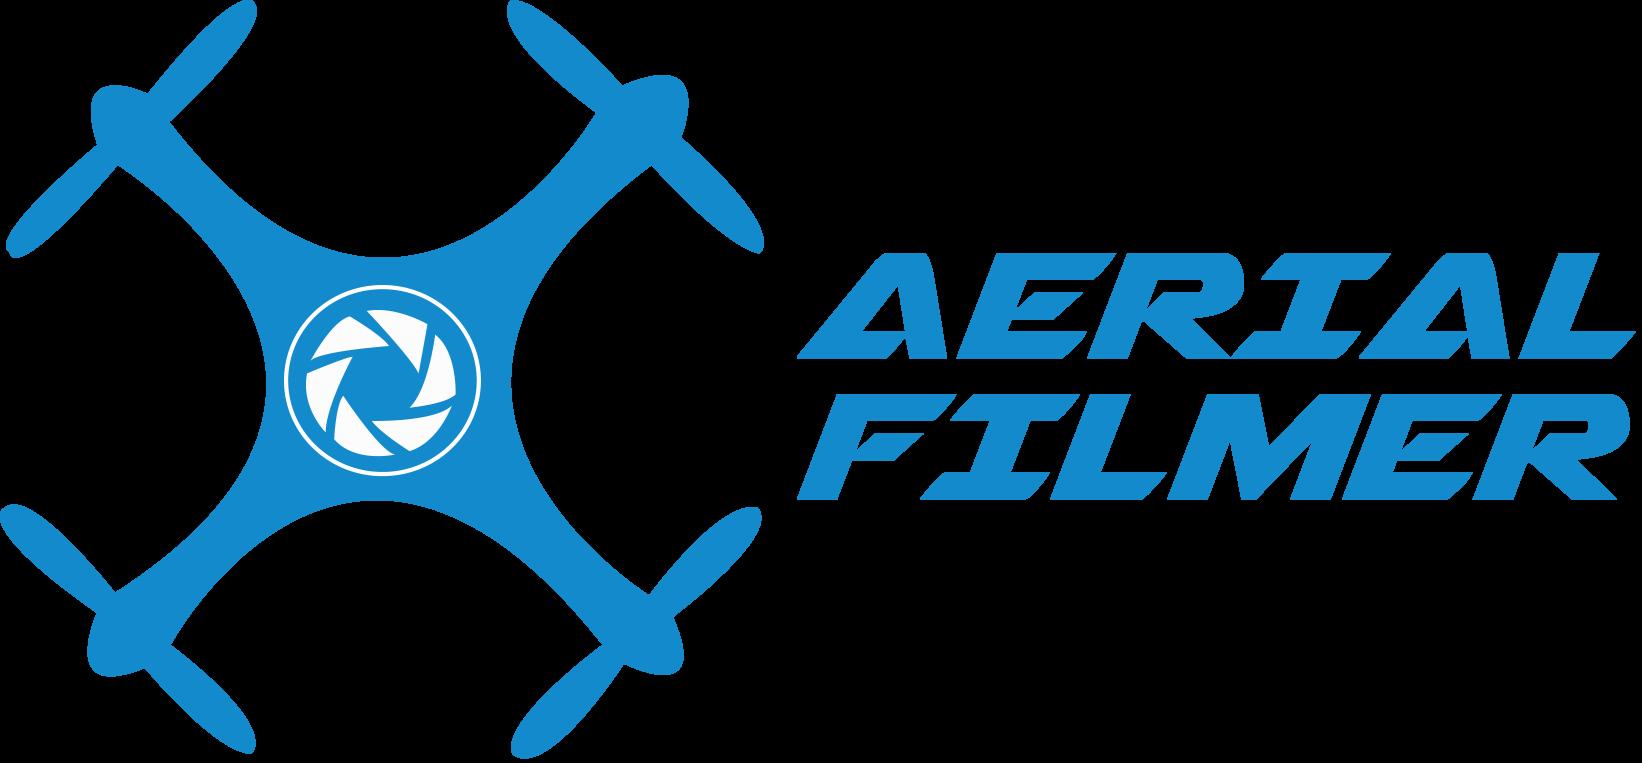 Aerial Filmer